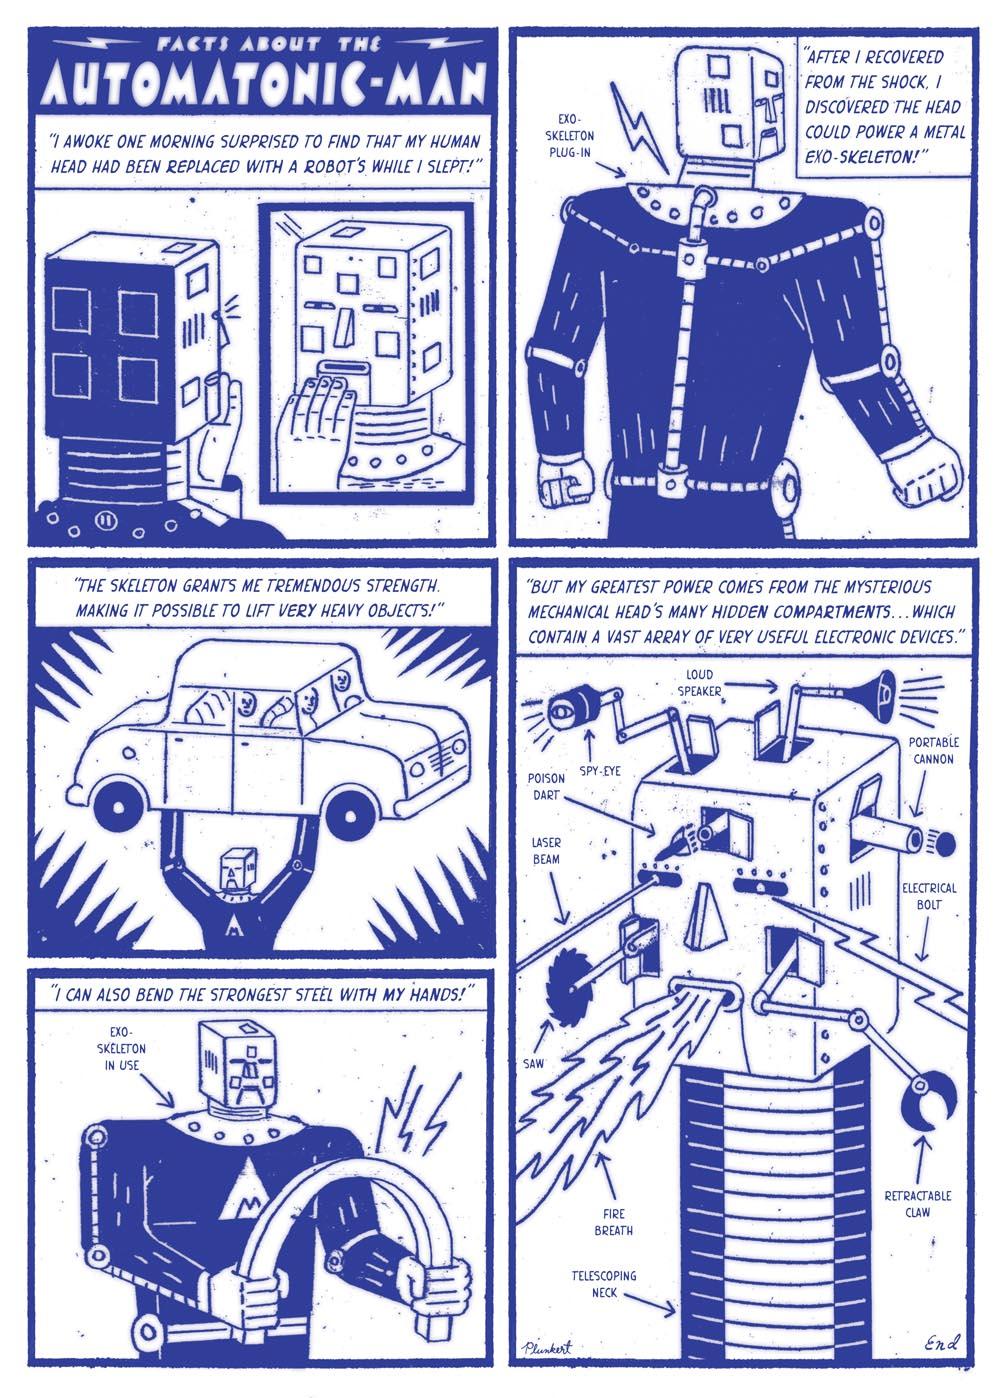 automatonic-man-panel.jpg